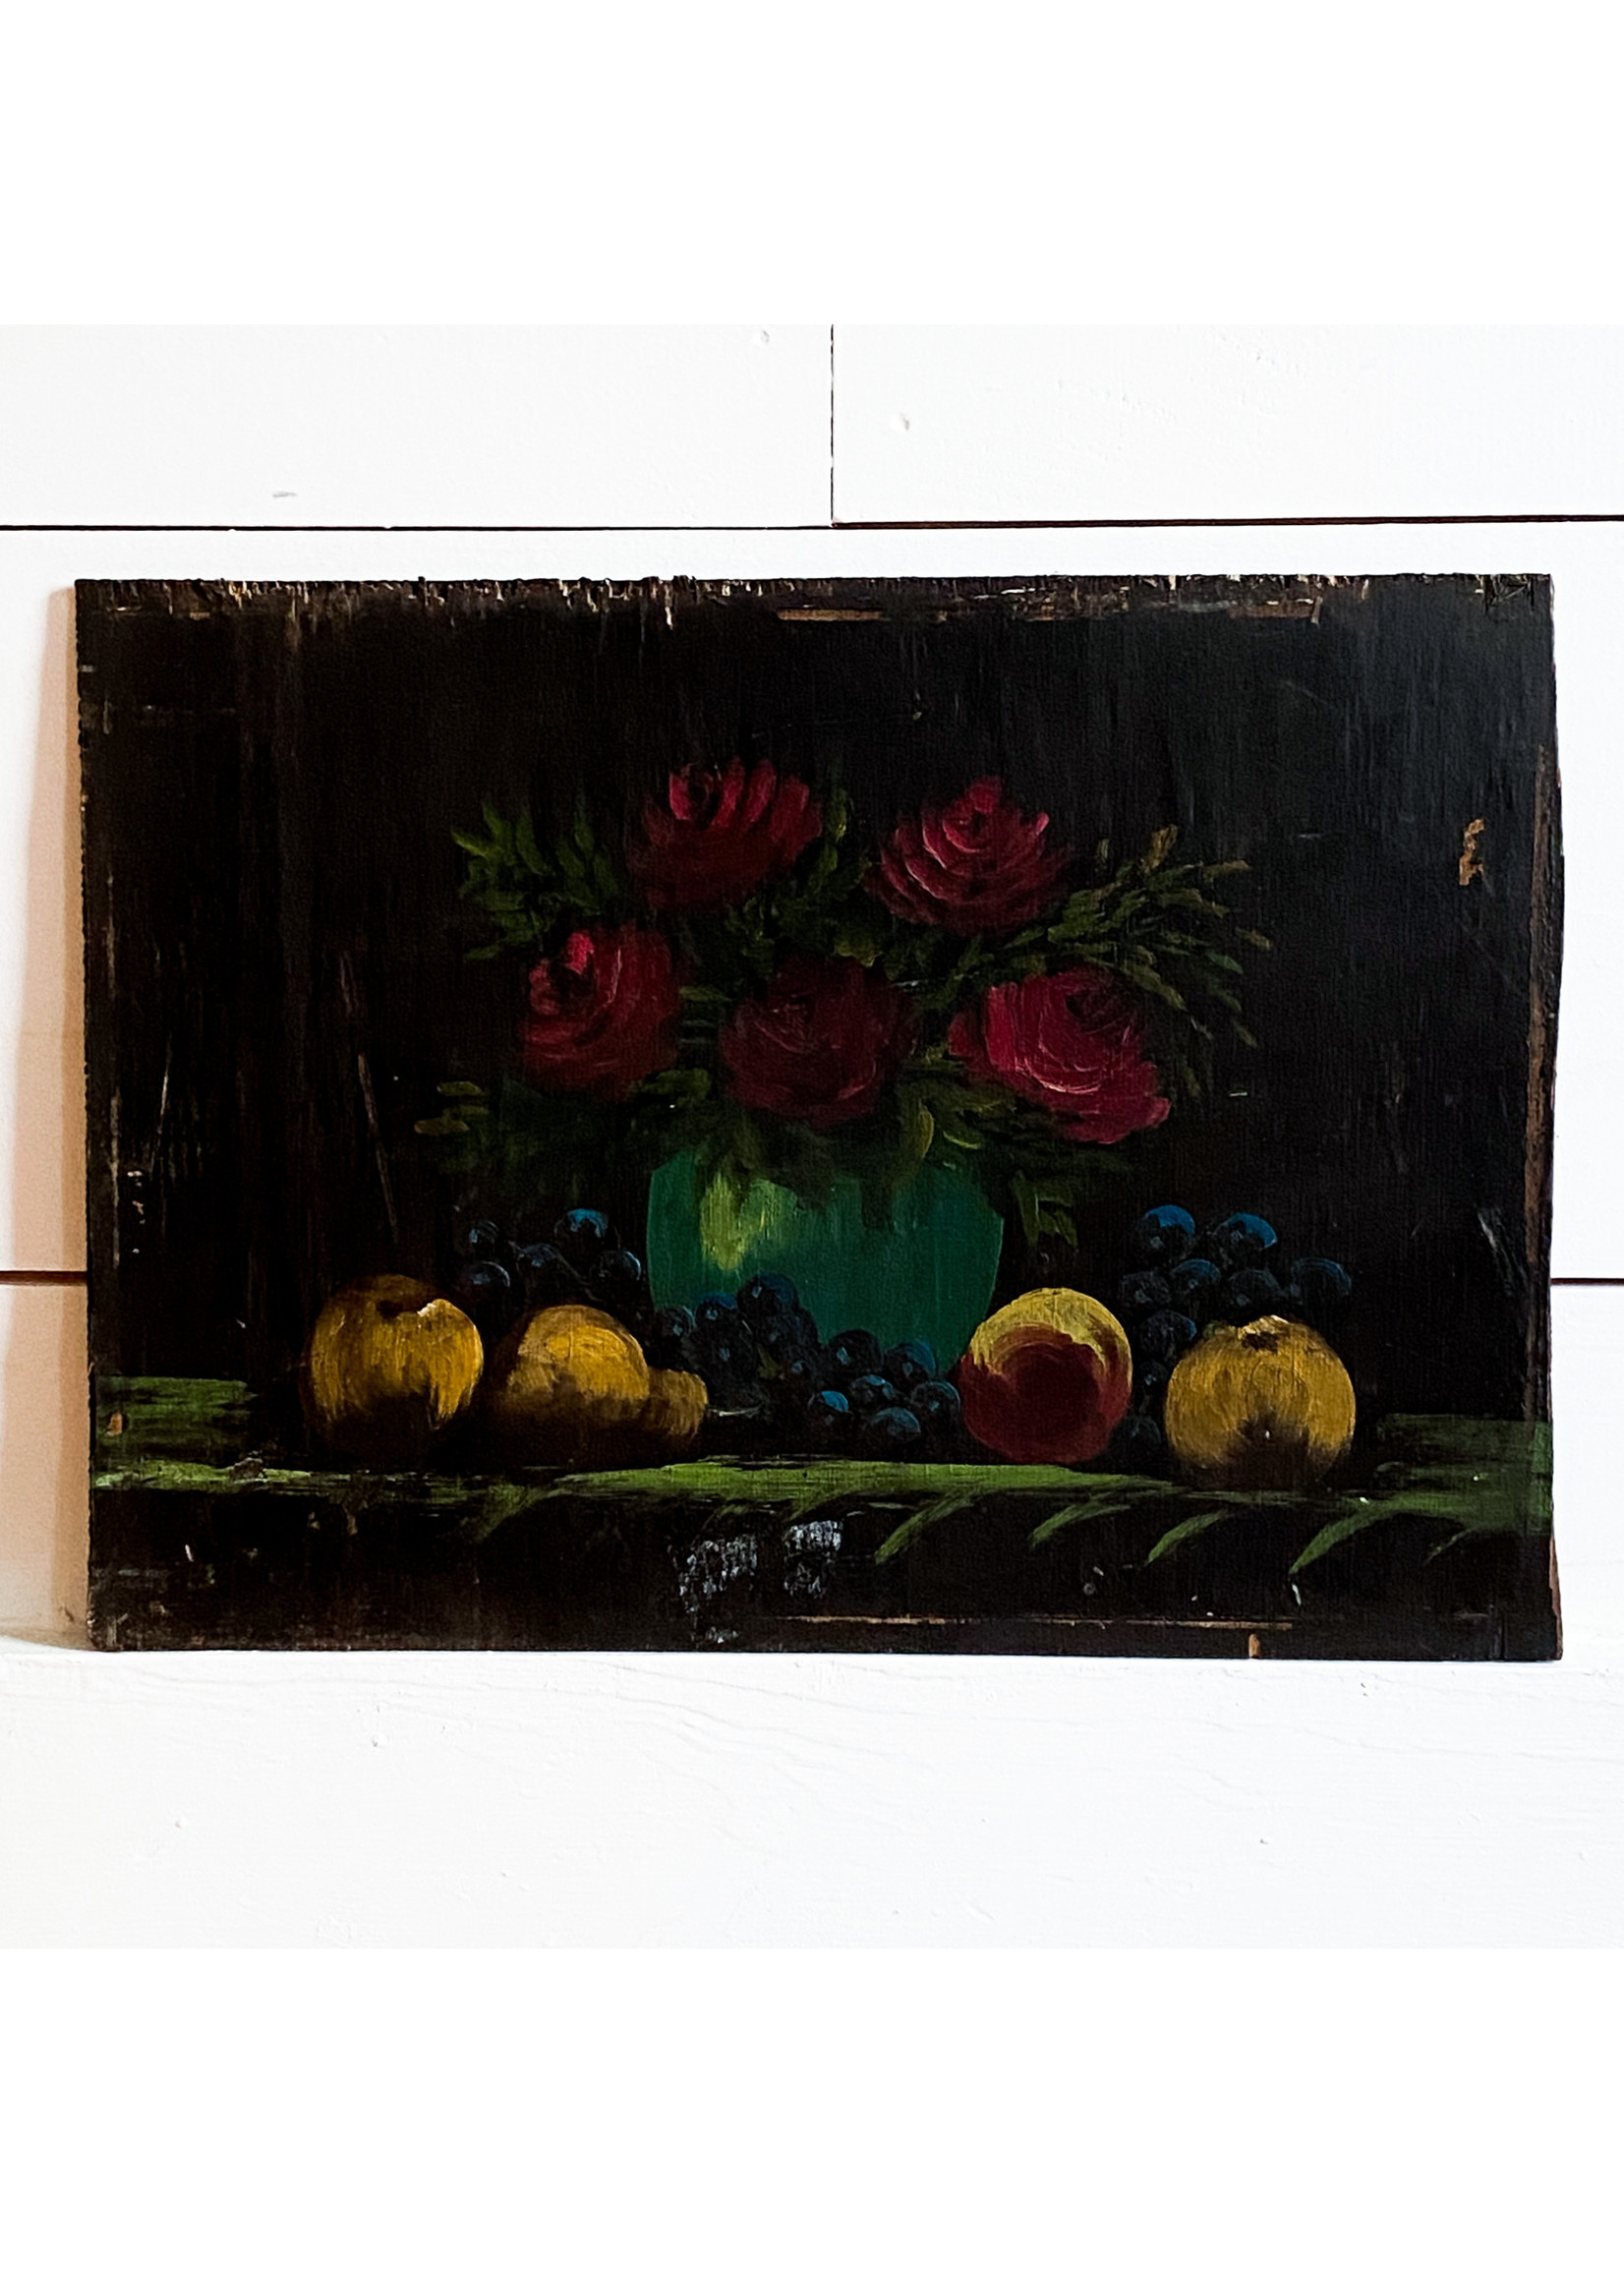 Antique Still Life Painting - No Frame